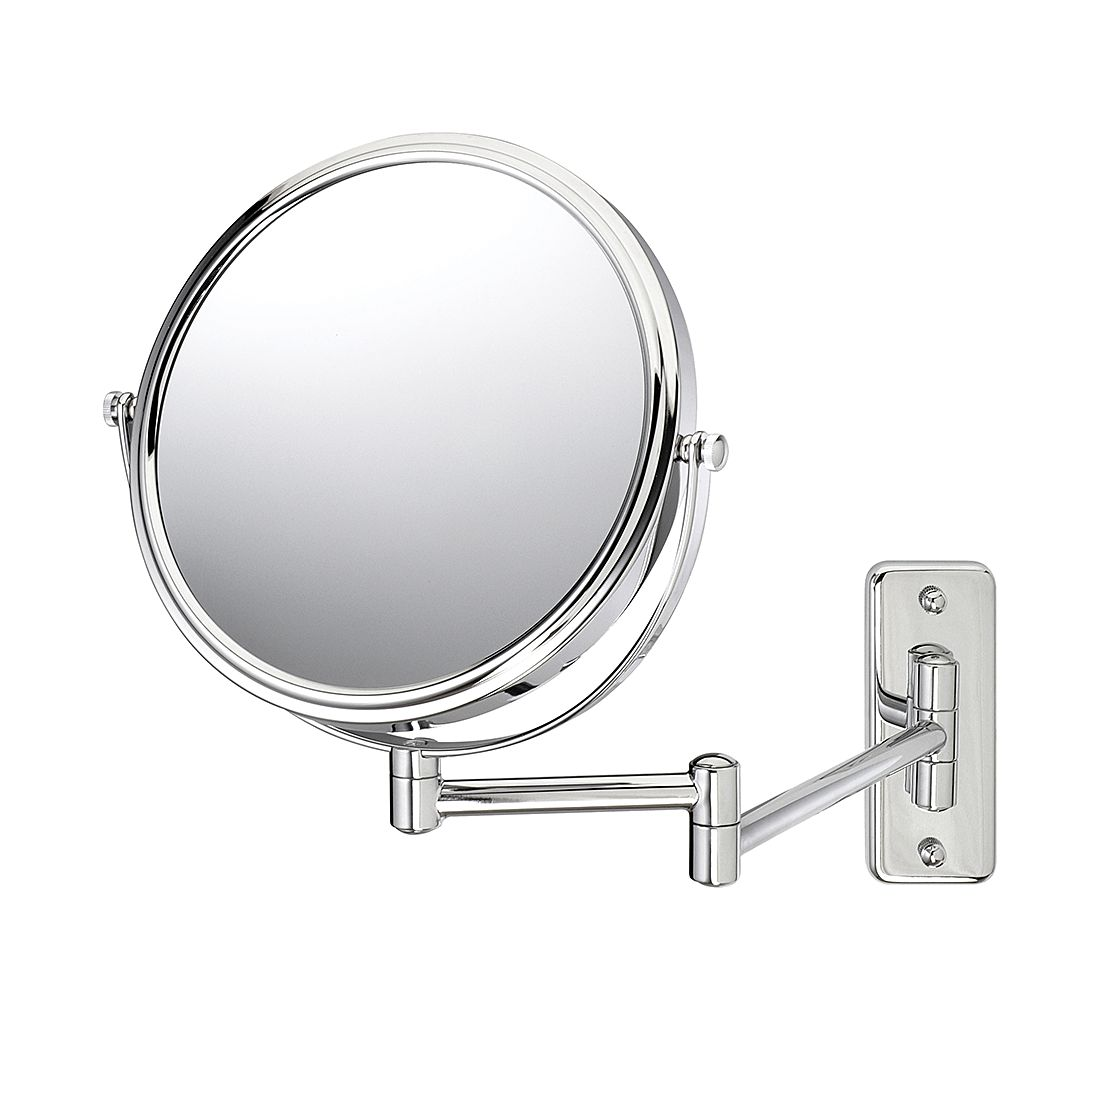 Miroir mural Bea - Chrome Avec grossissement x 5, Sanwood